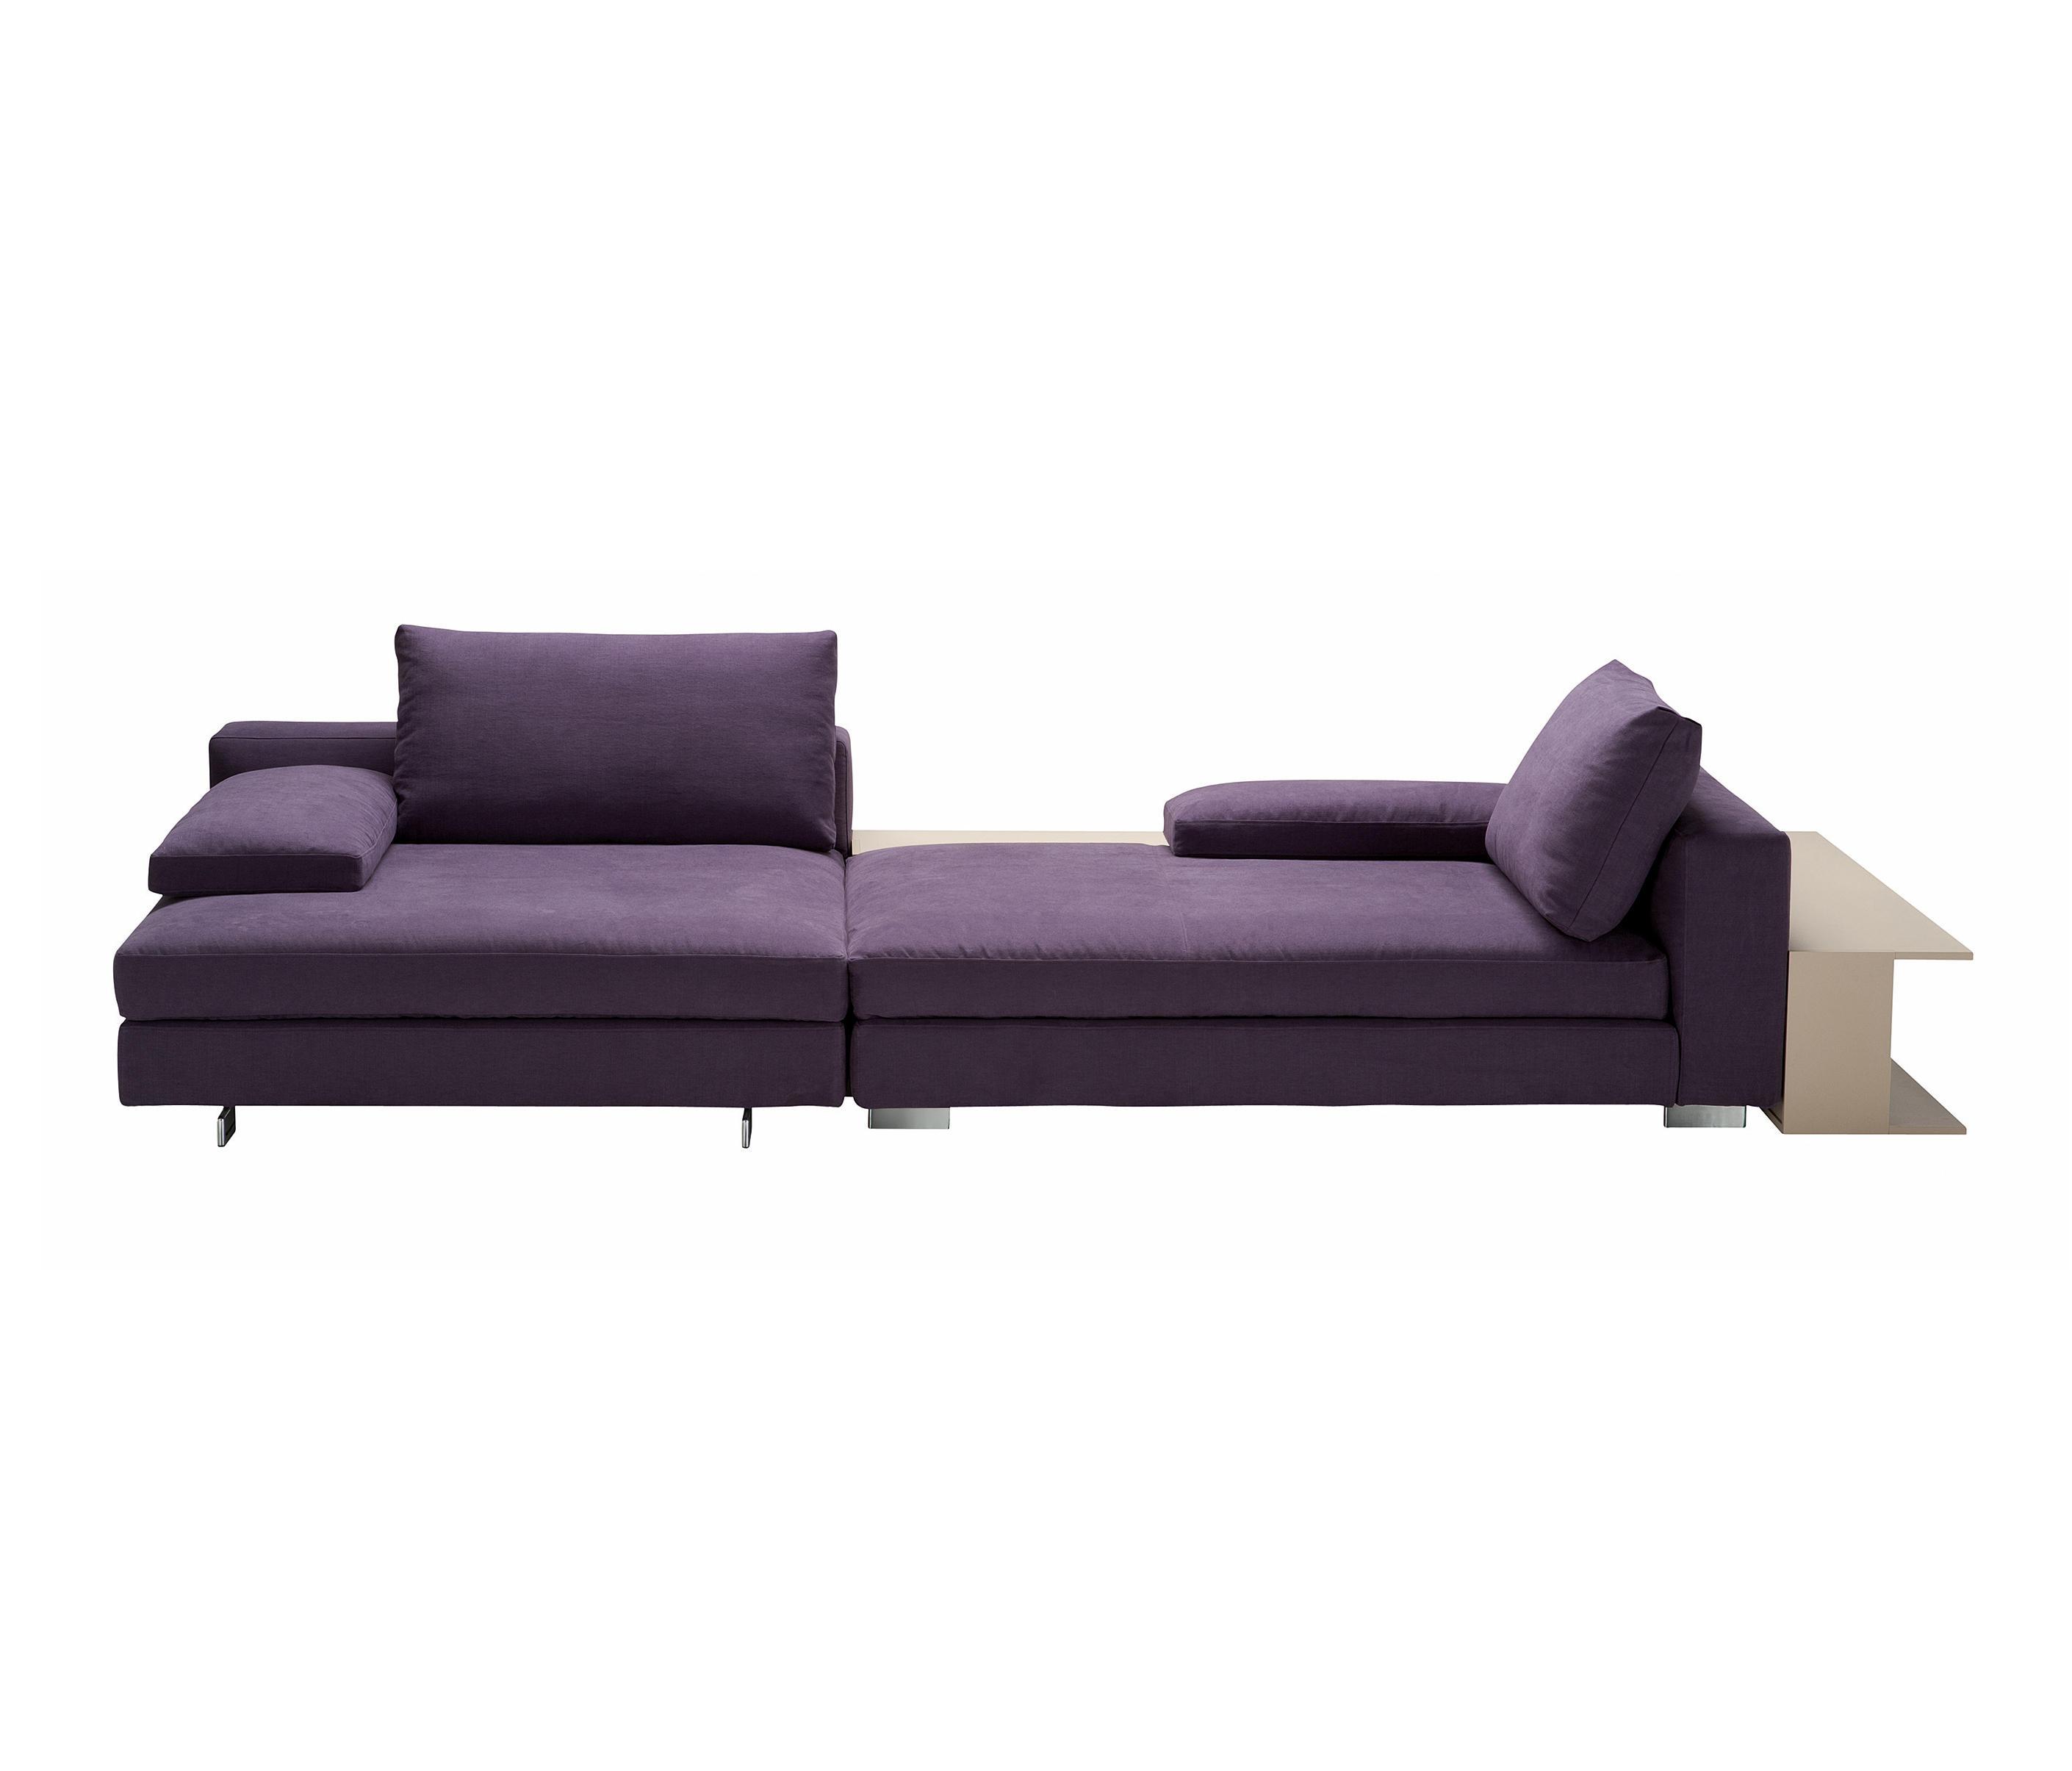 zanotta sofa bed chesterfield tufted leather sleeper ソファ koochy by デザイン karim rashid